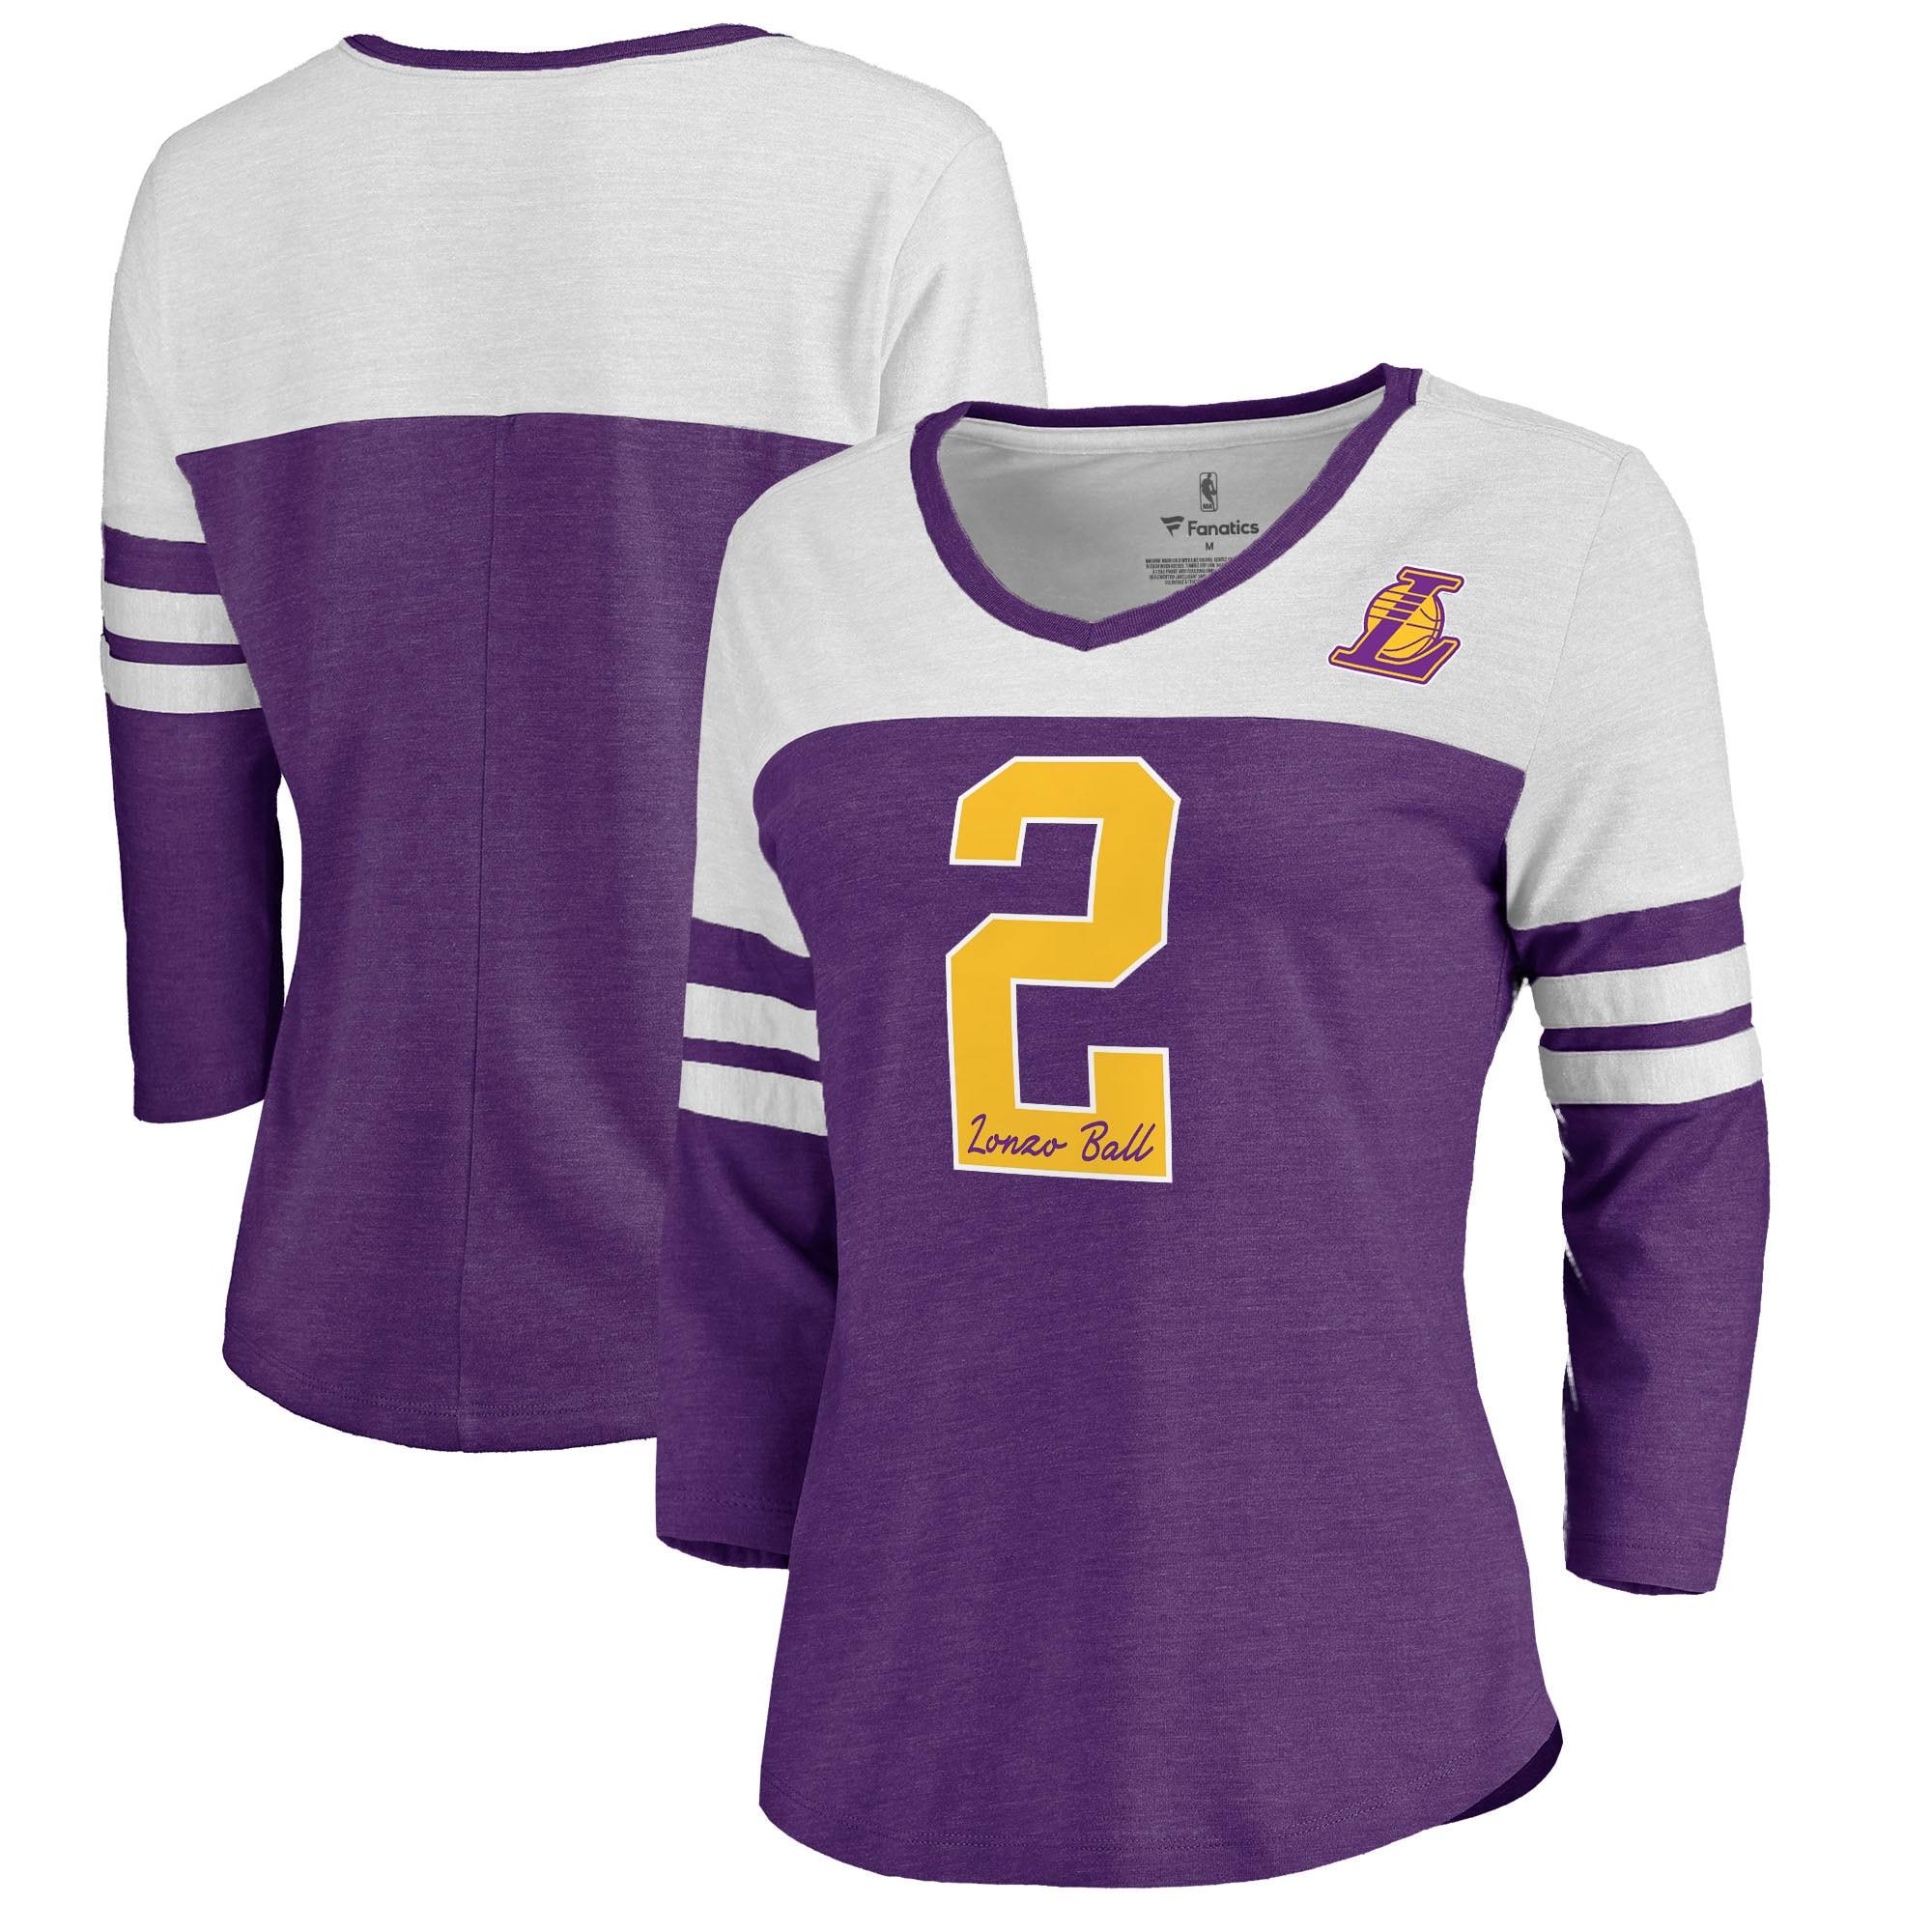 Lonzo Ball Los Angeles Lakers Fanatics Branded Women's Starstruck Name & Number Tri-Blend 3/4-Sleeve V-Neck T-Shirt - Purple